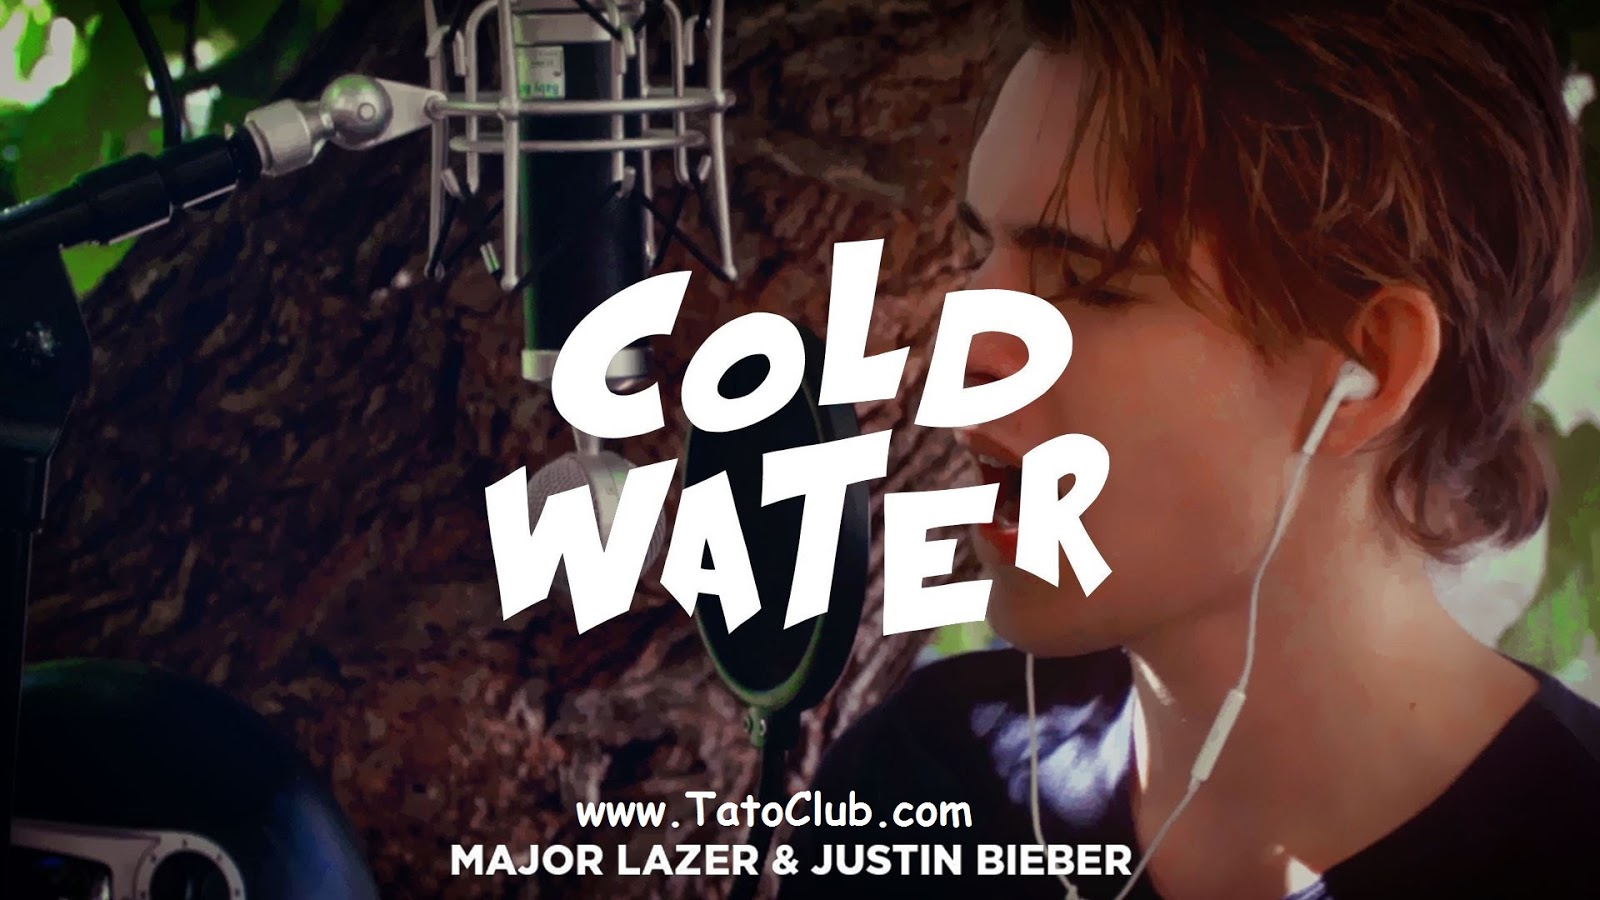 cold water major lazer justin bieber mp3 download